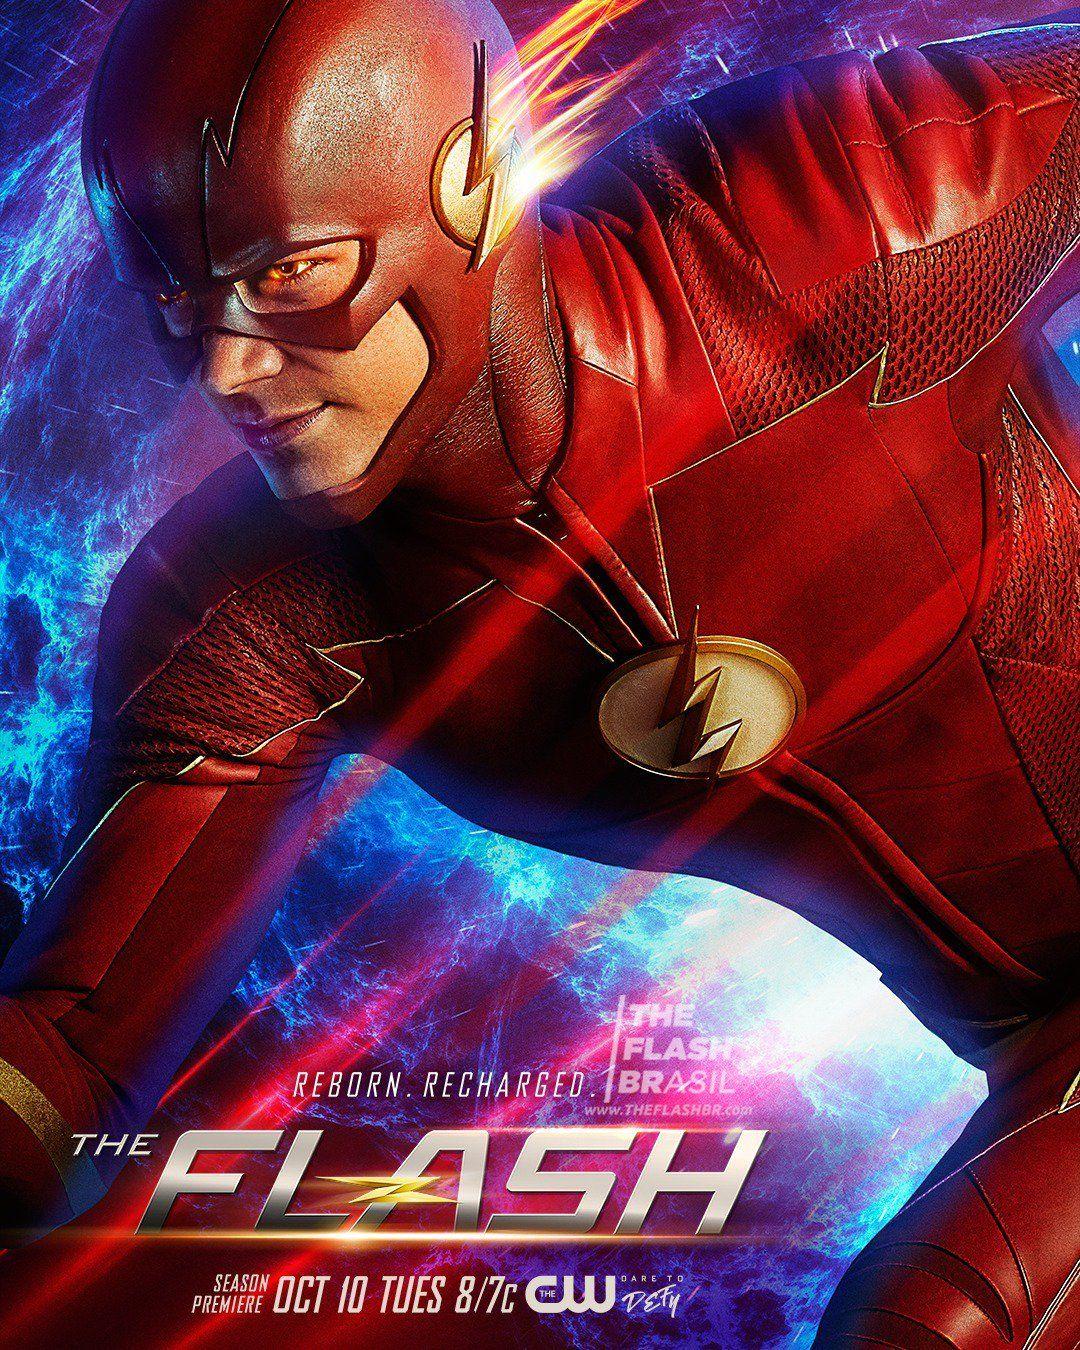 The Flash Bra On Westallen Love Flash Season 4 The Flash